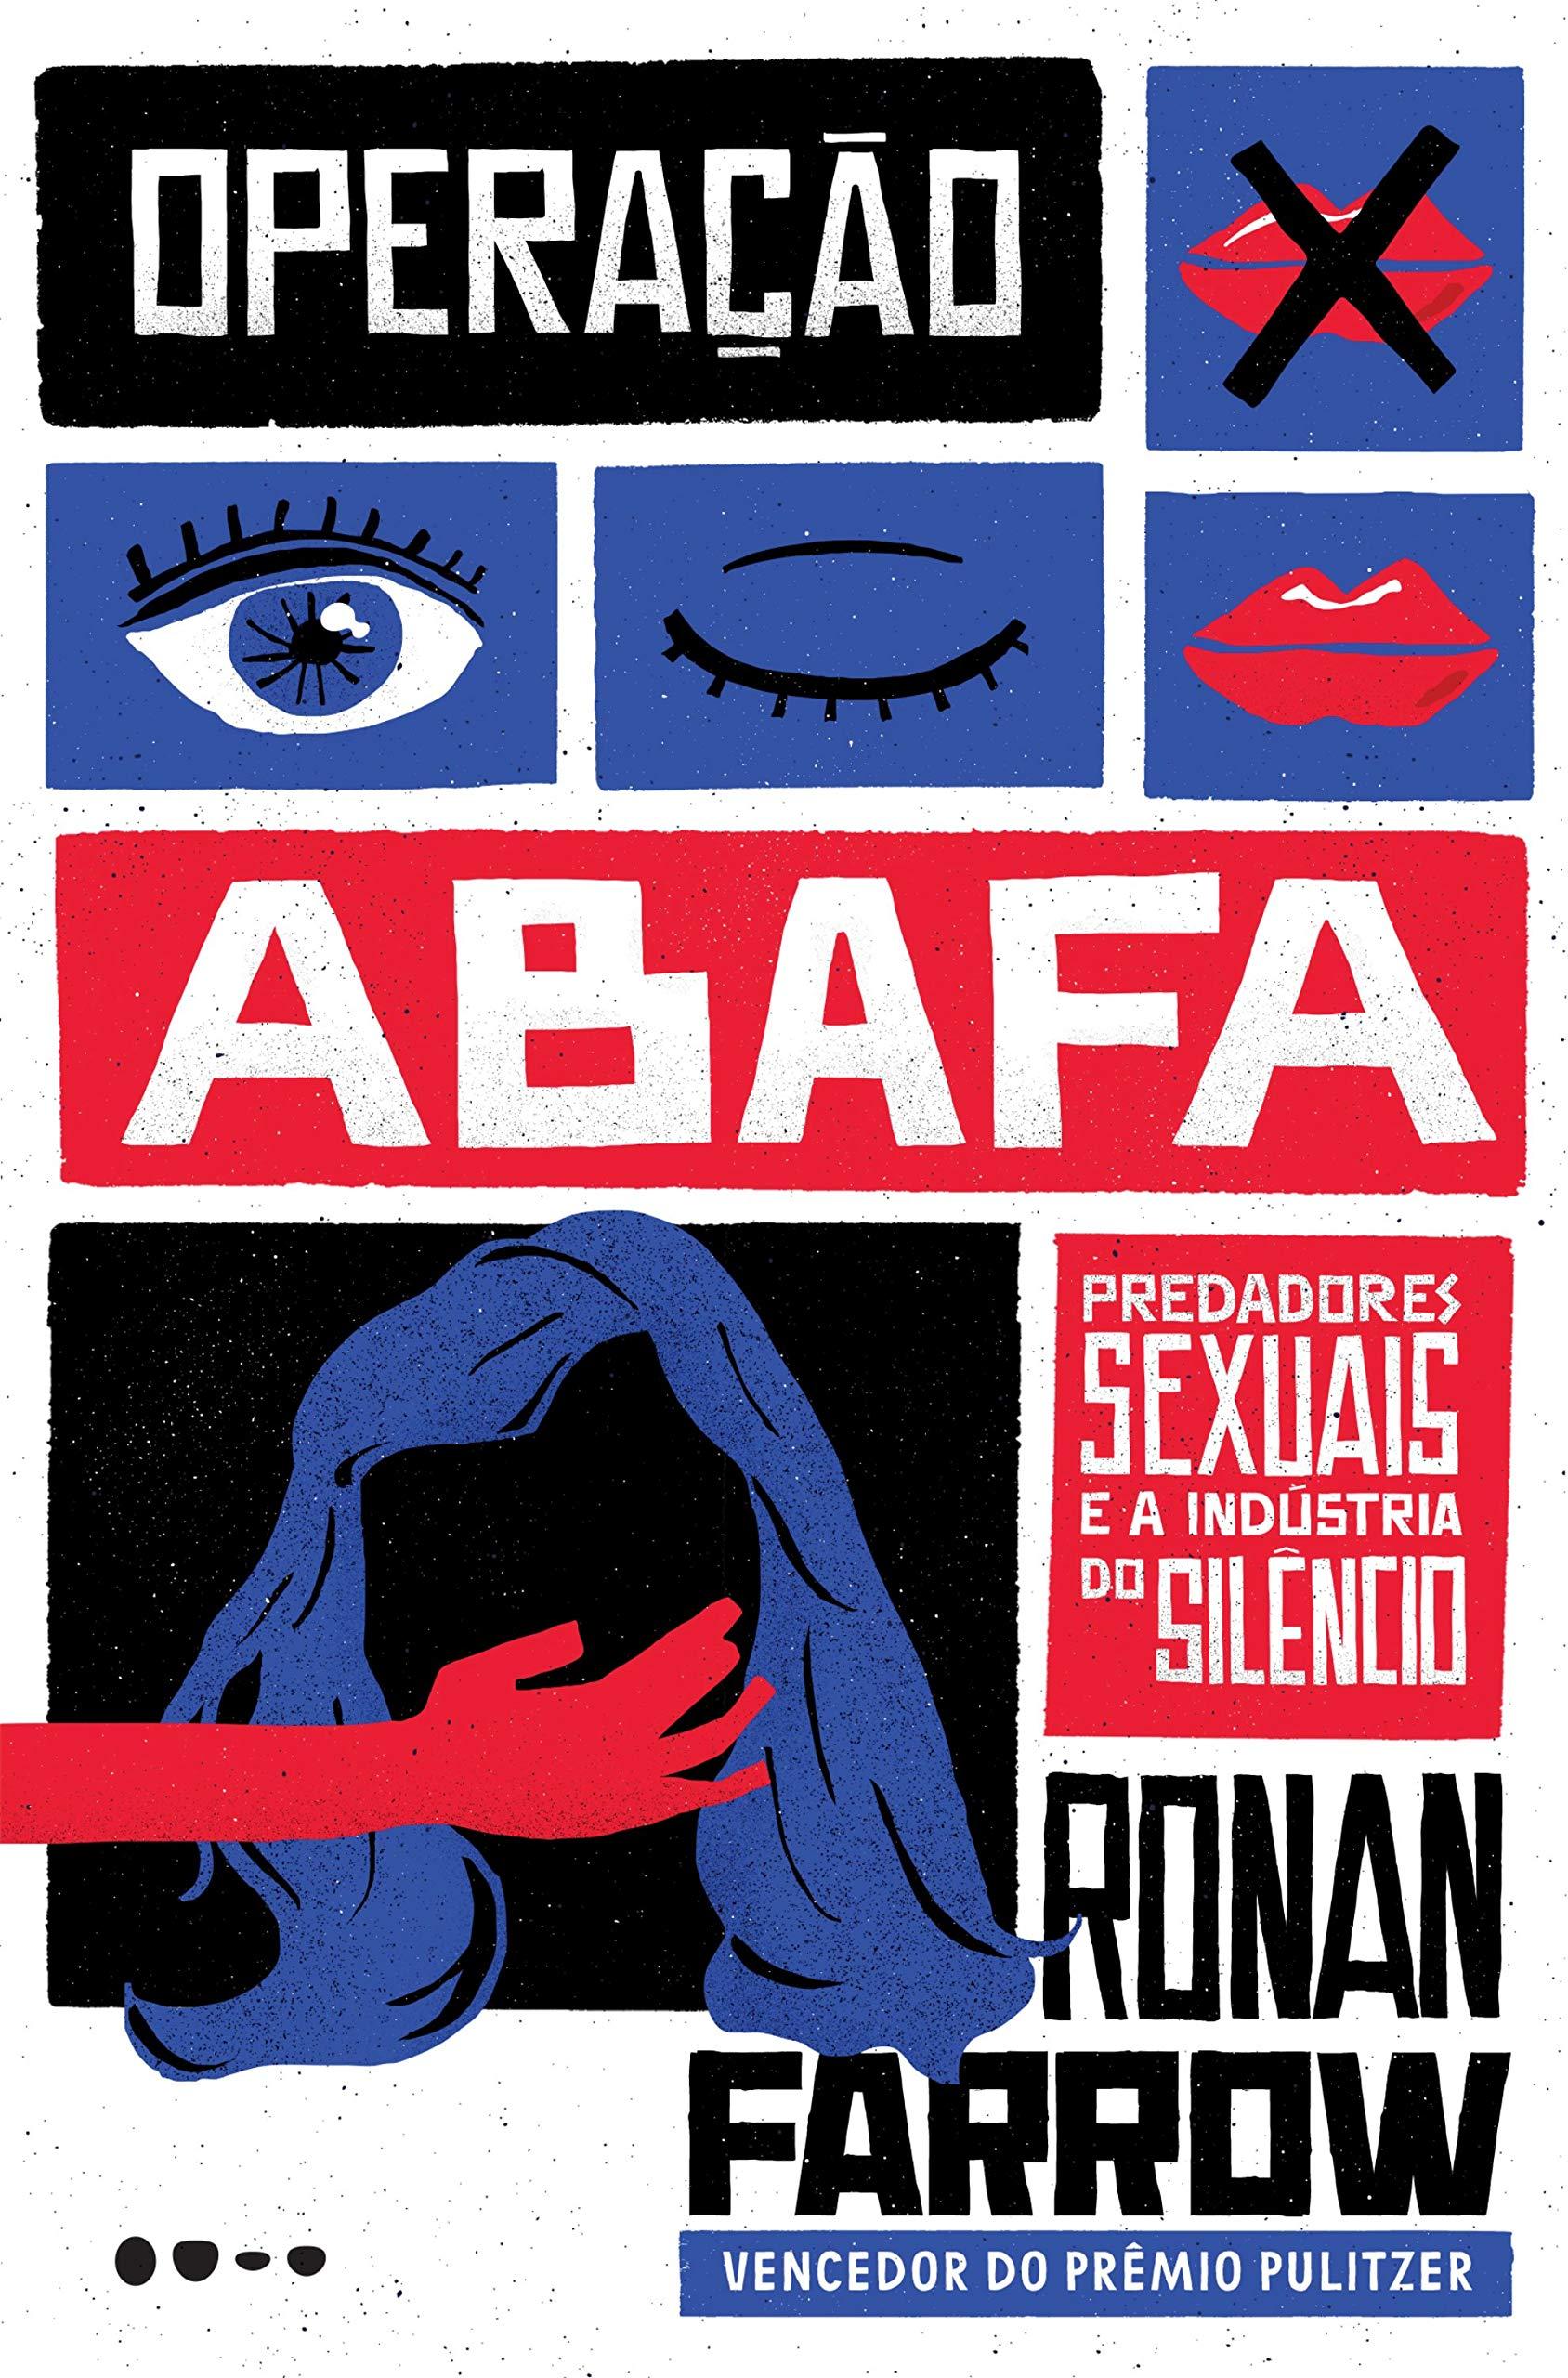 Operação abafa: Predadores sexuais e a industria do silêncio by Ronan Farrow